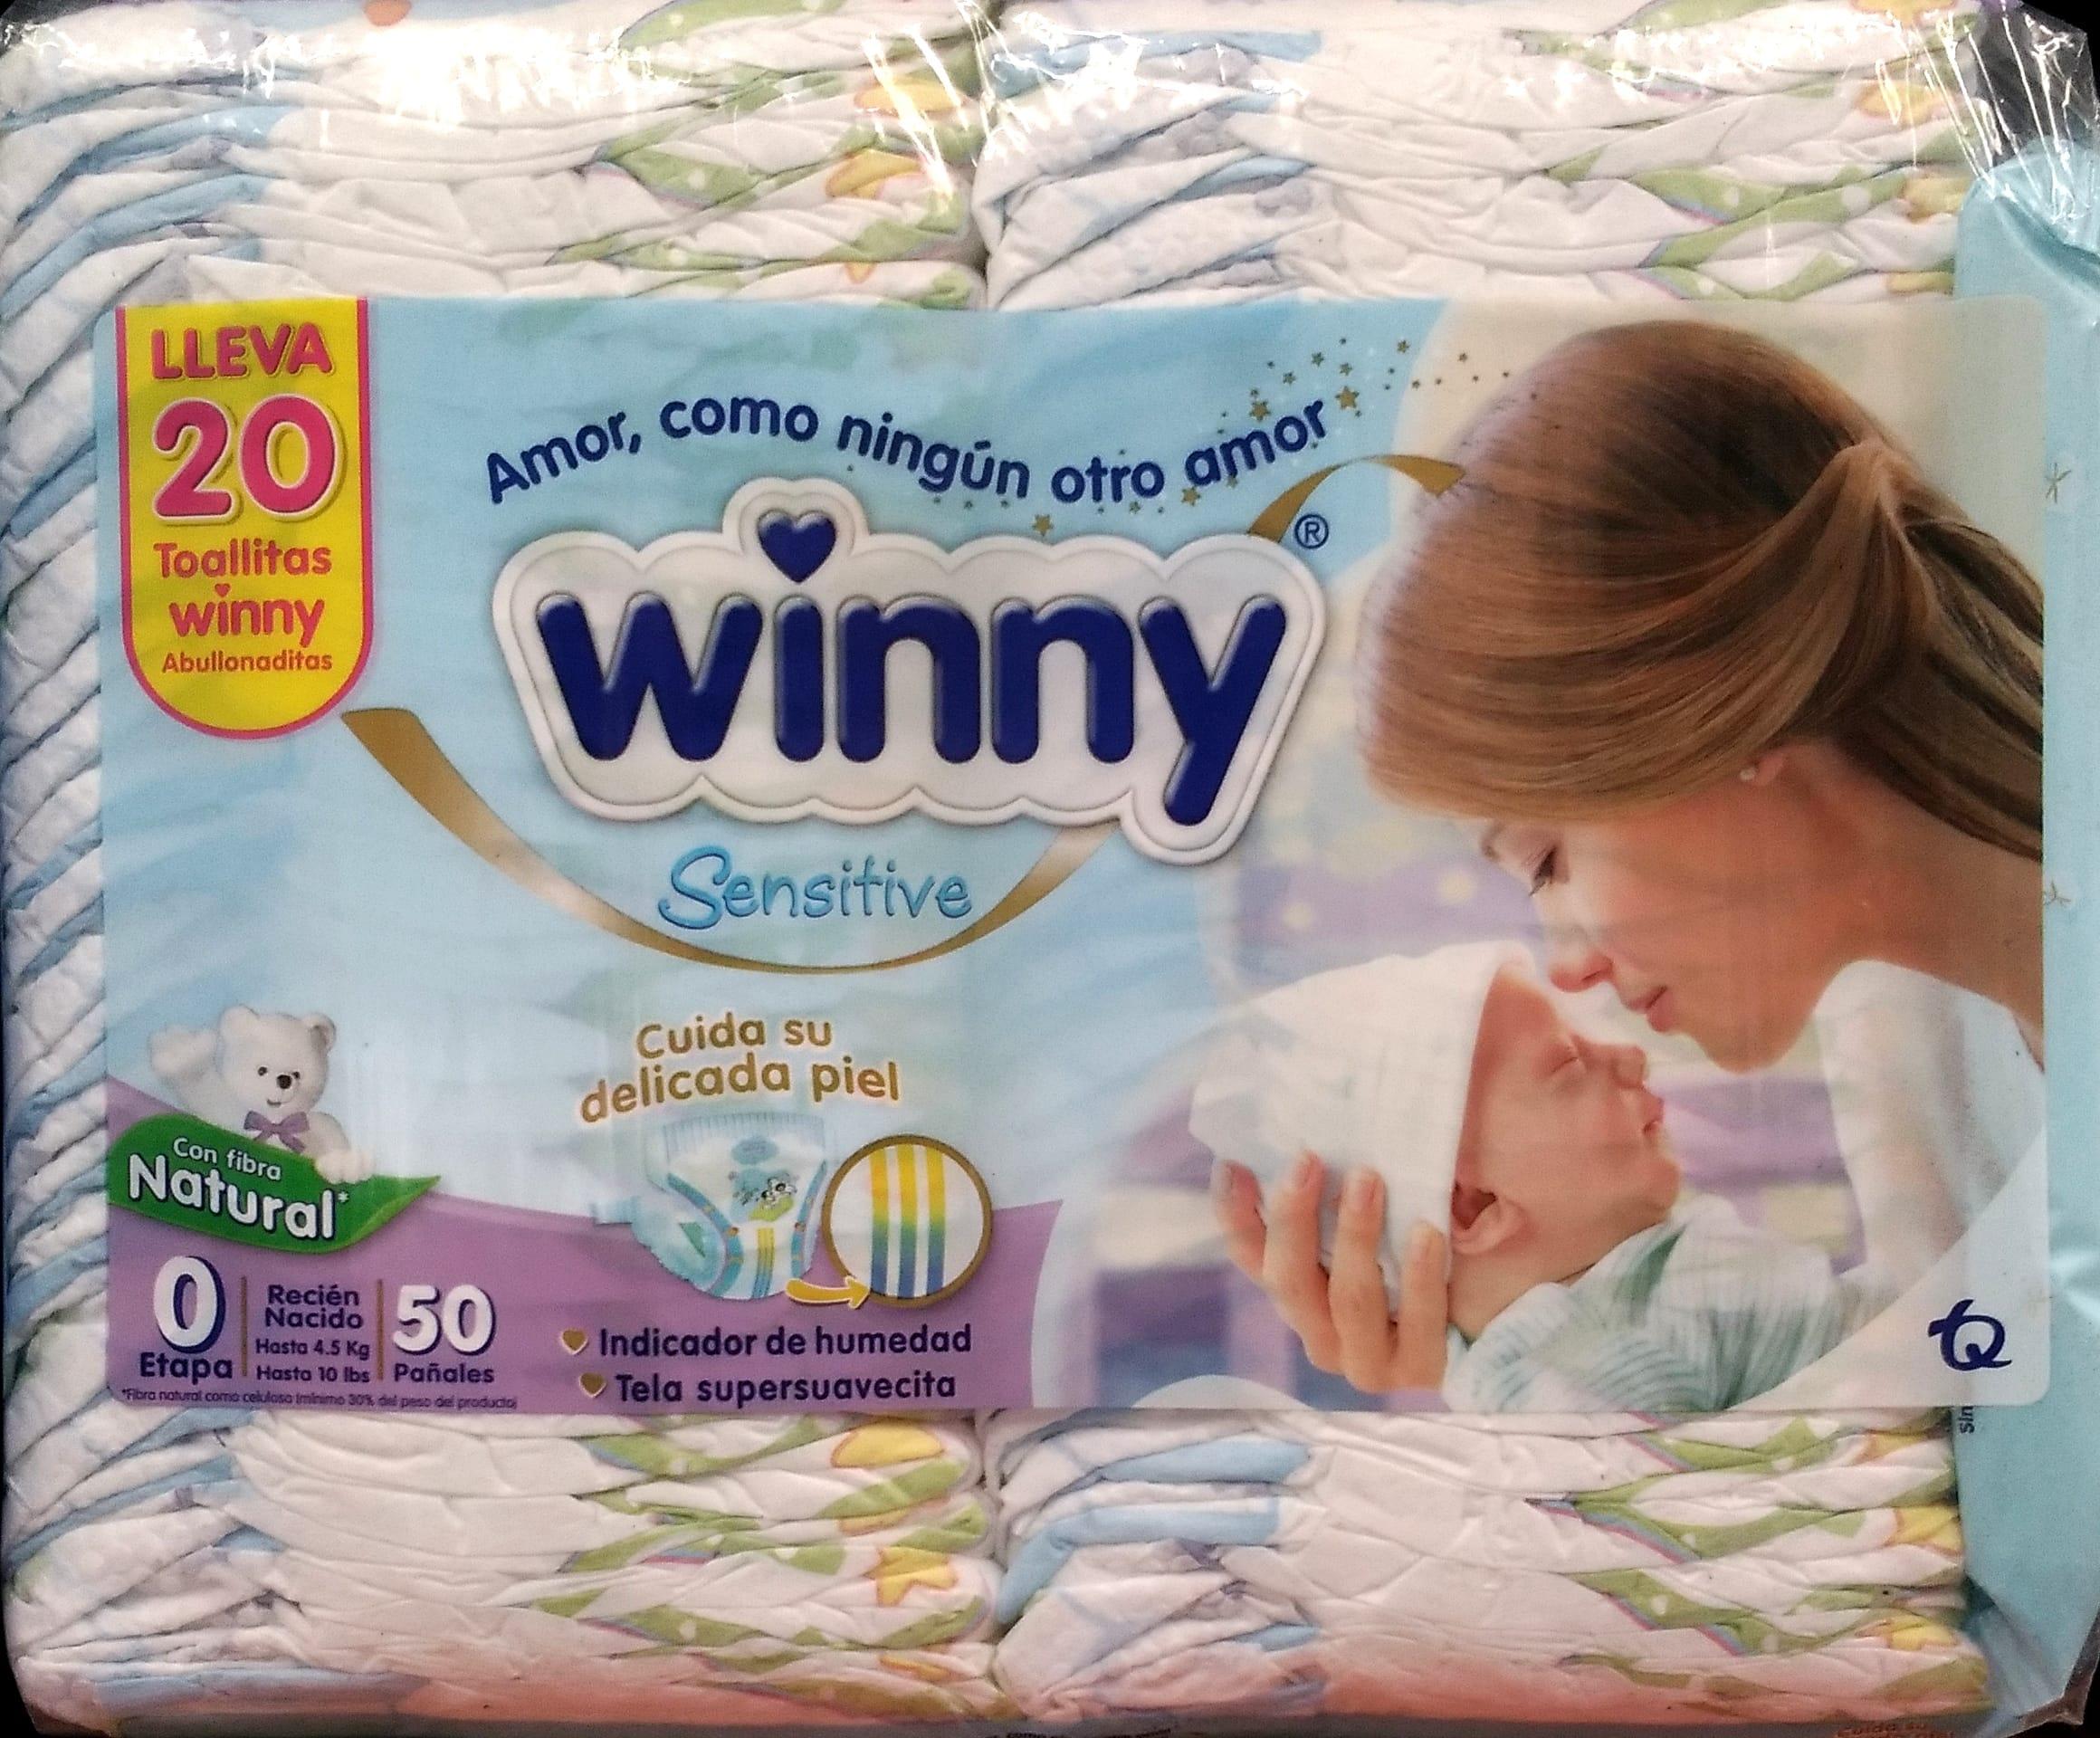 Pañal Winny Sensitive Recien Nacido x50 Toallitas Húmedas